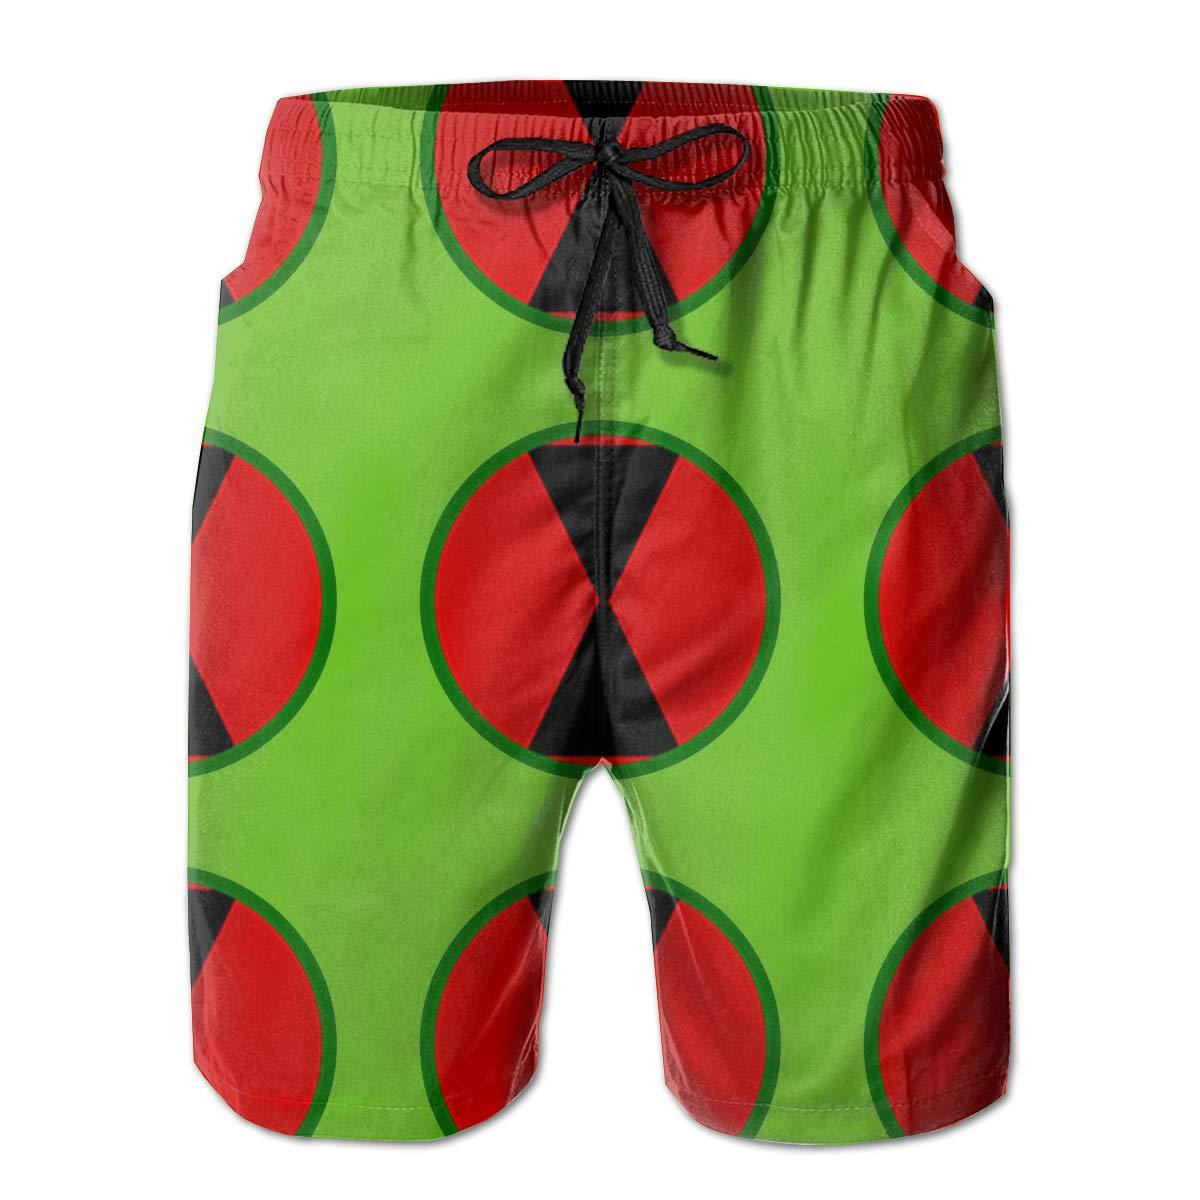 7th Infantry Division Logo Mens Swim Trunks Bathing Suit Beach Shorts